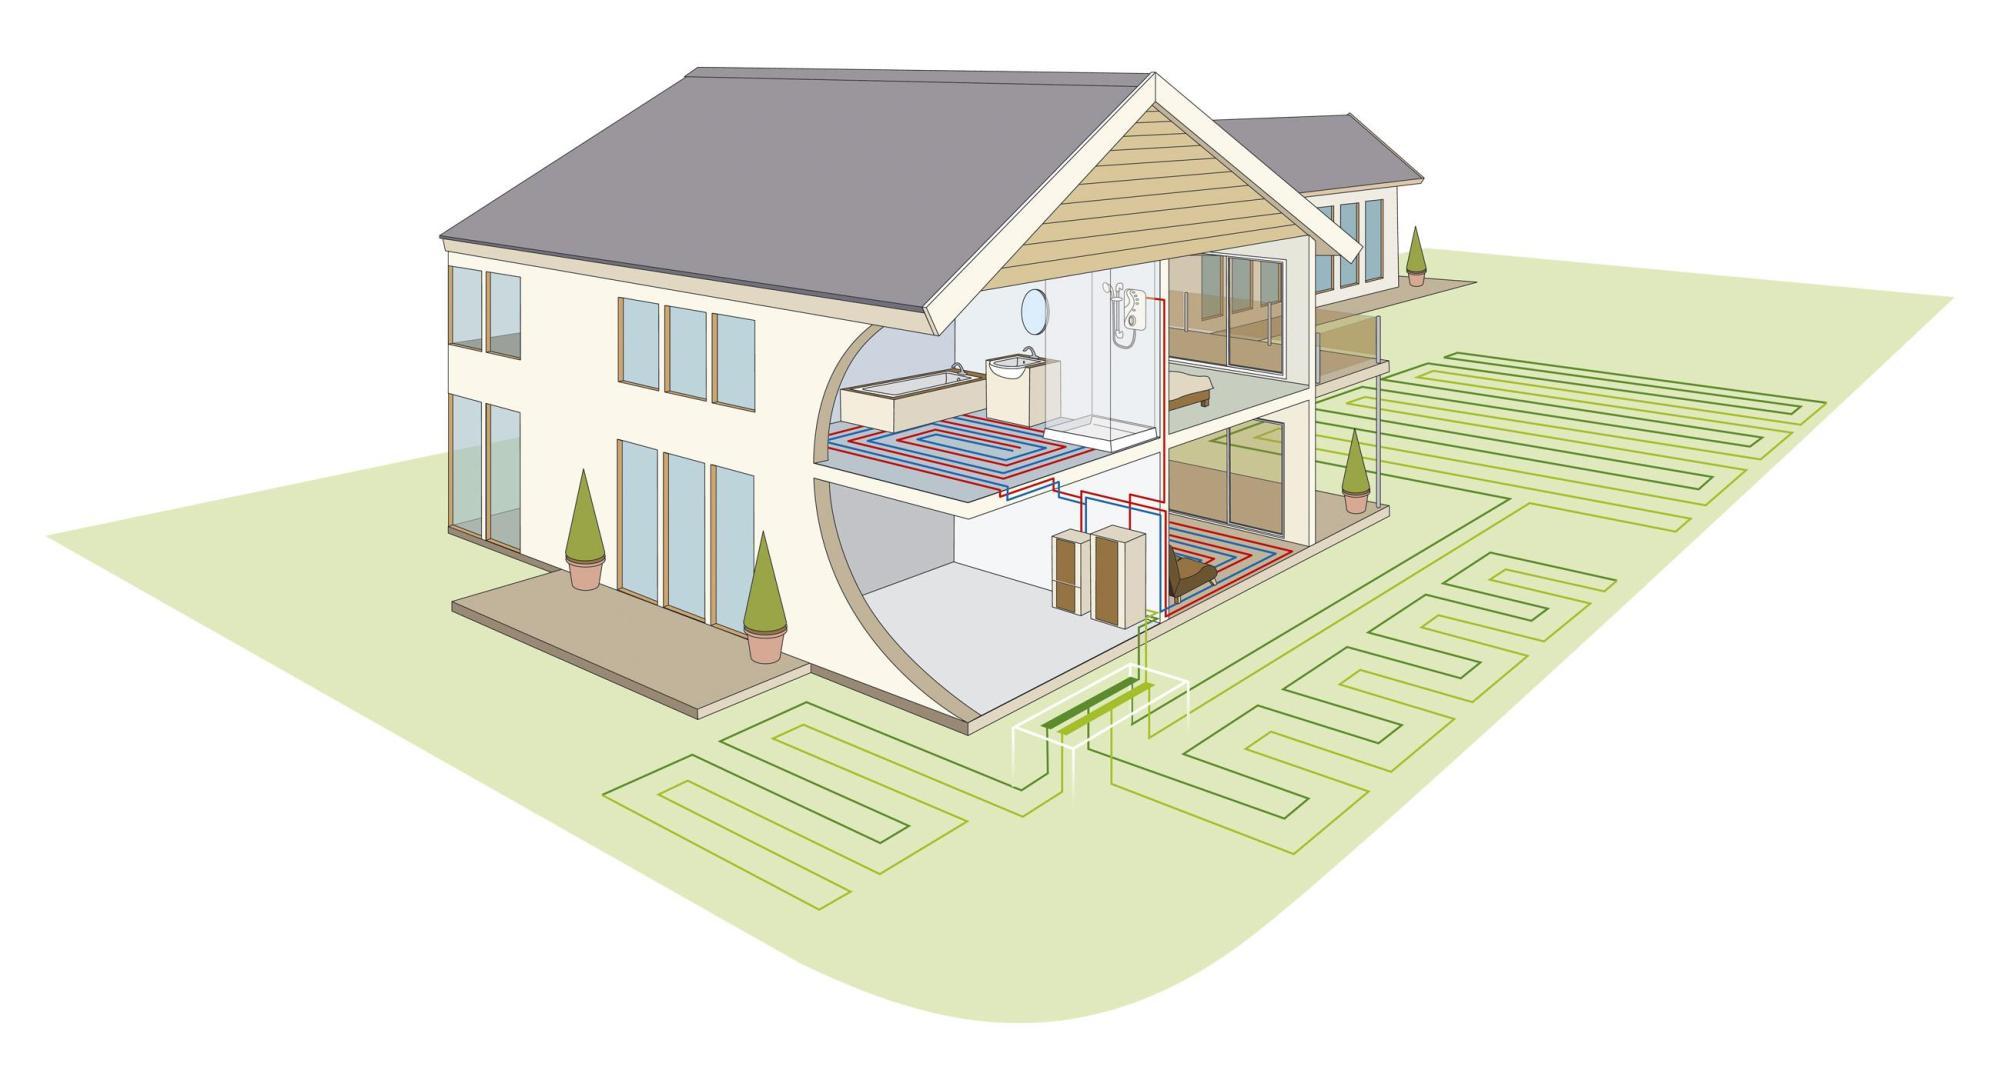 hight resolution of dimplex heat pump house horizontal schematic horizontal ground loops